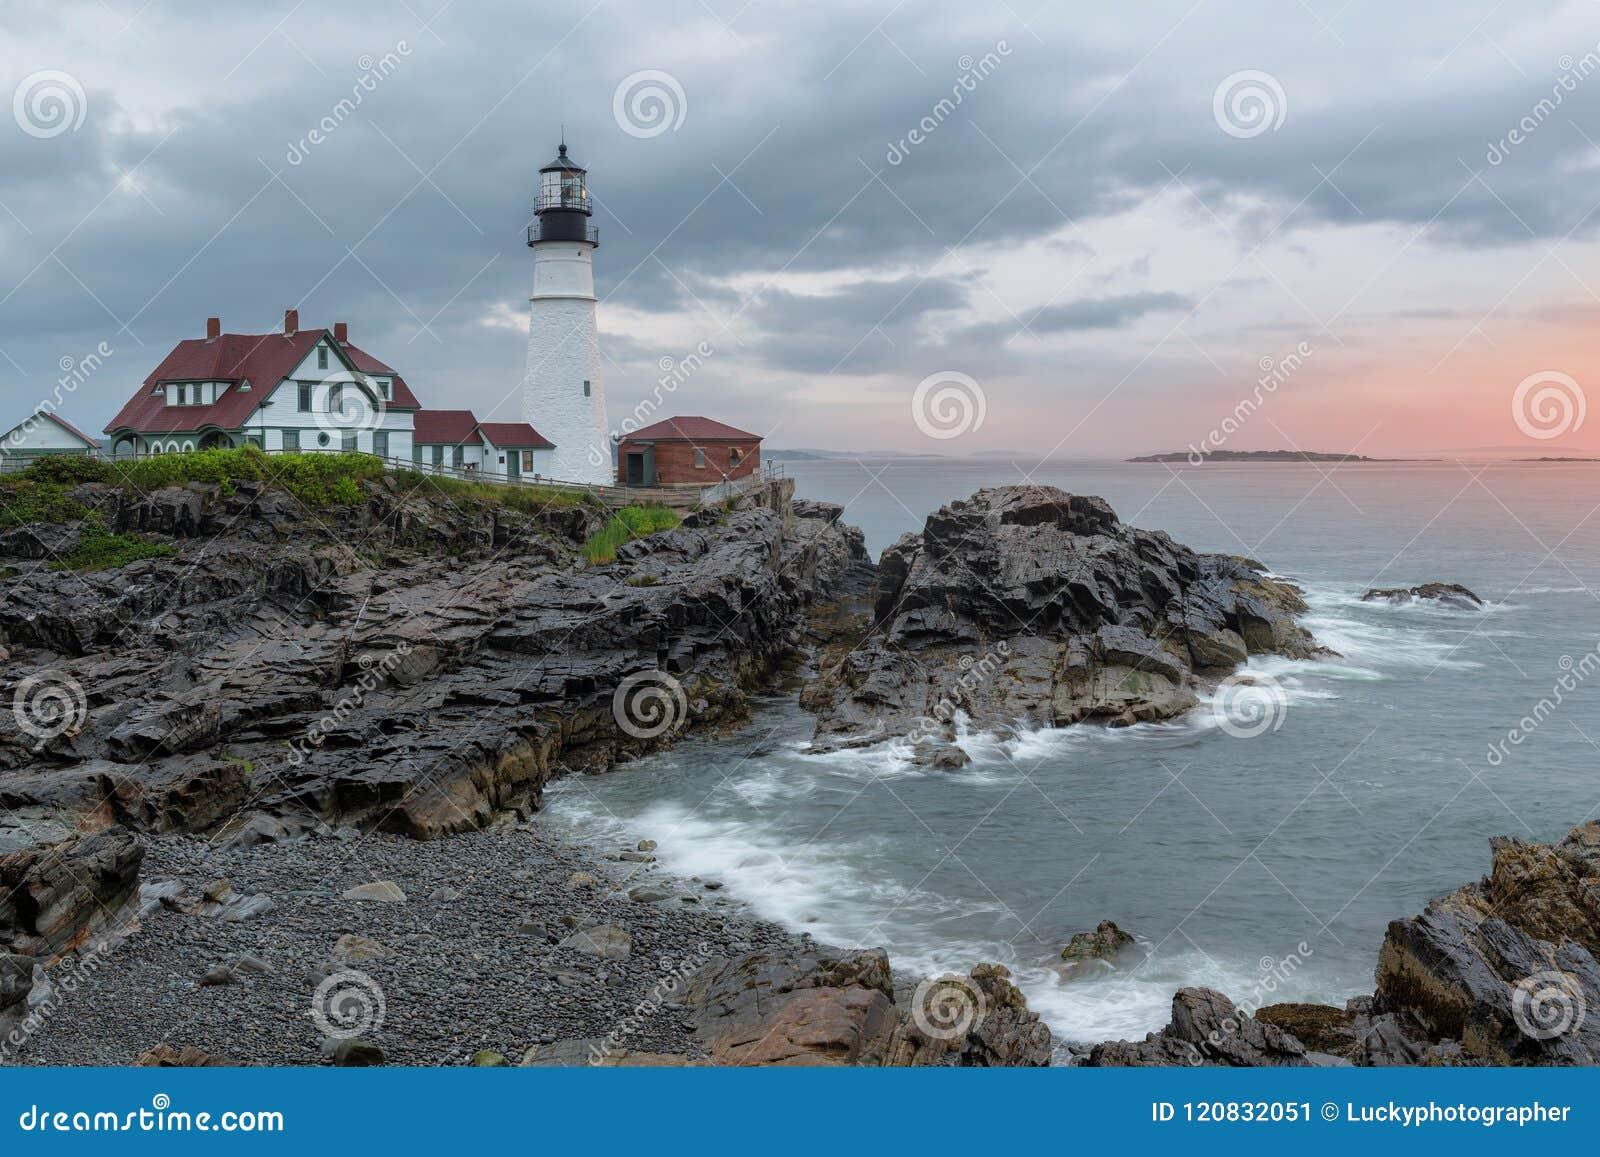 Portland Lighthouse at sunrise Maine, USA.